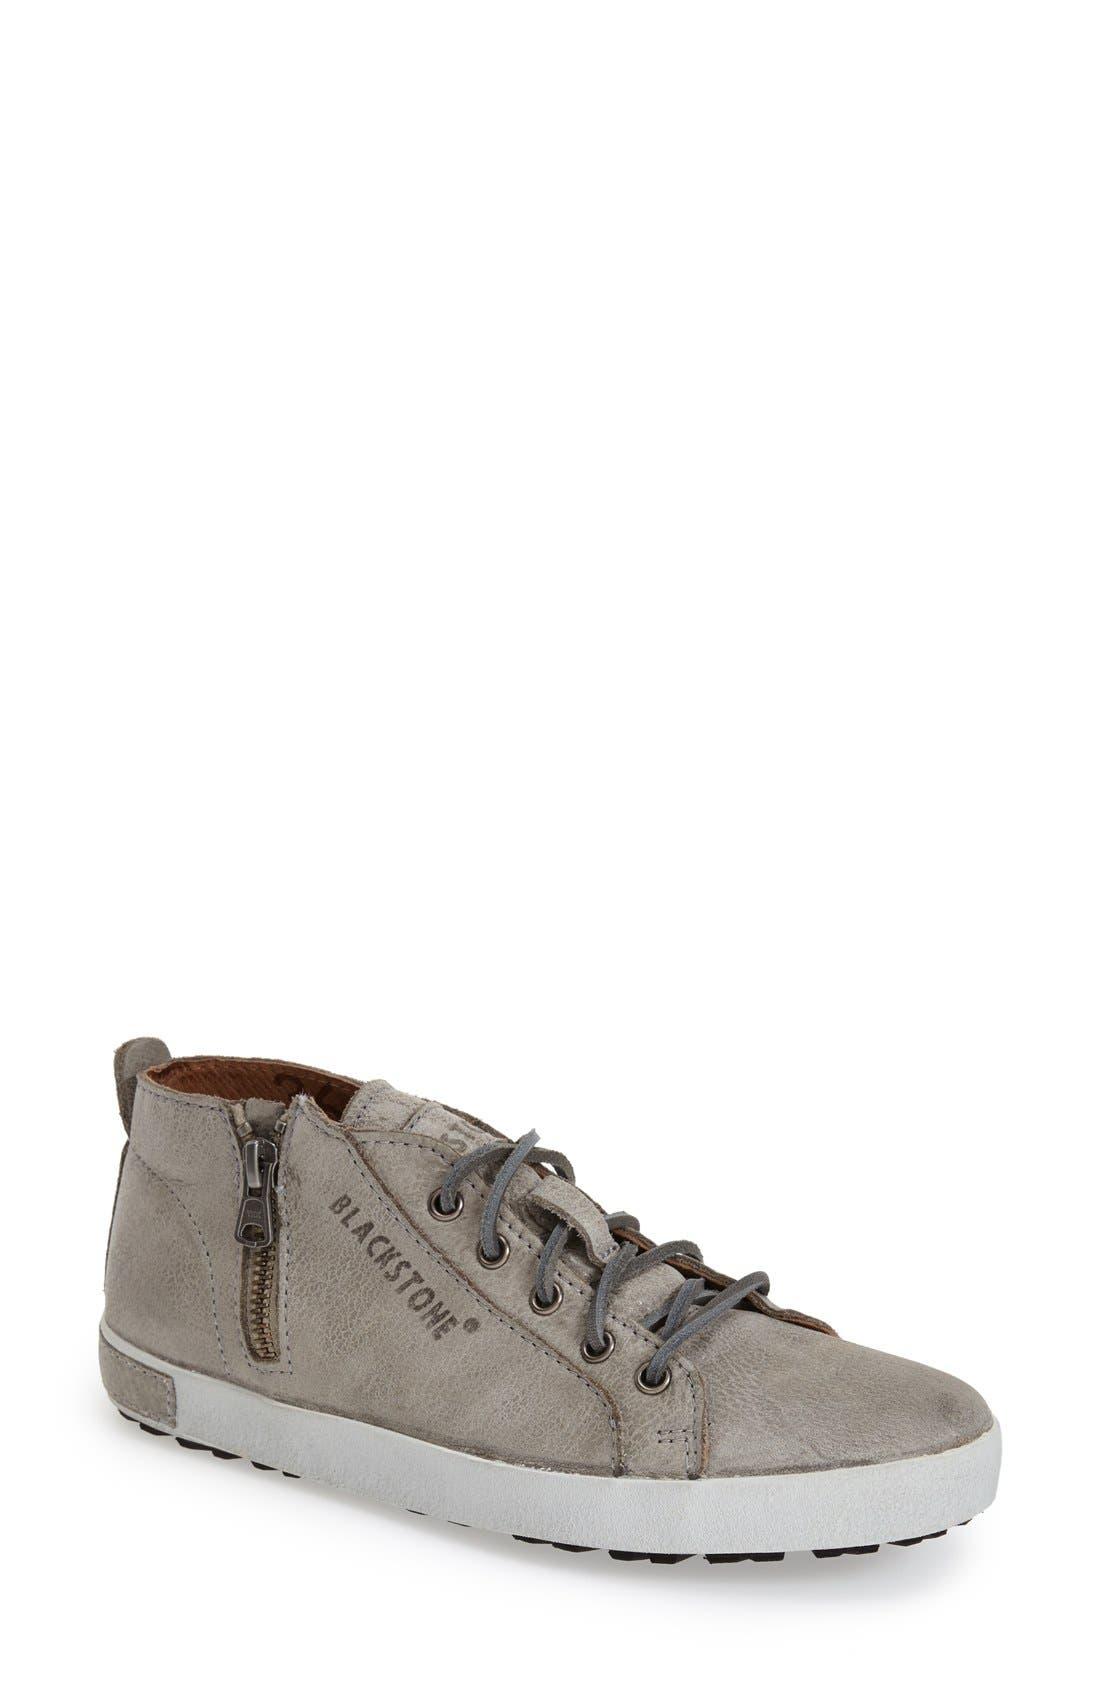 Alternate Image 1 Selected - Blackstone 'JL17' Sneaker (Women)